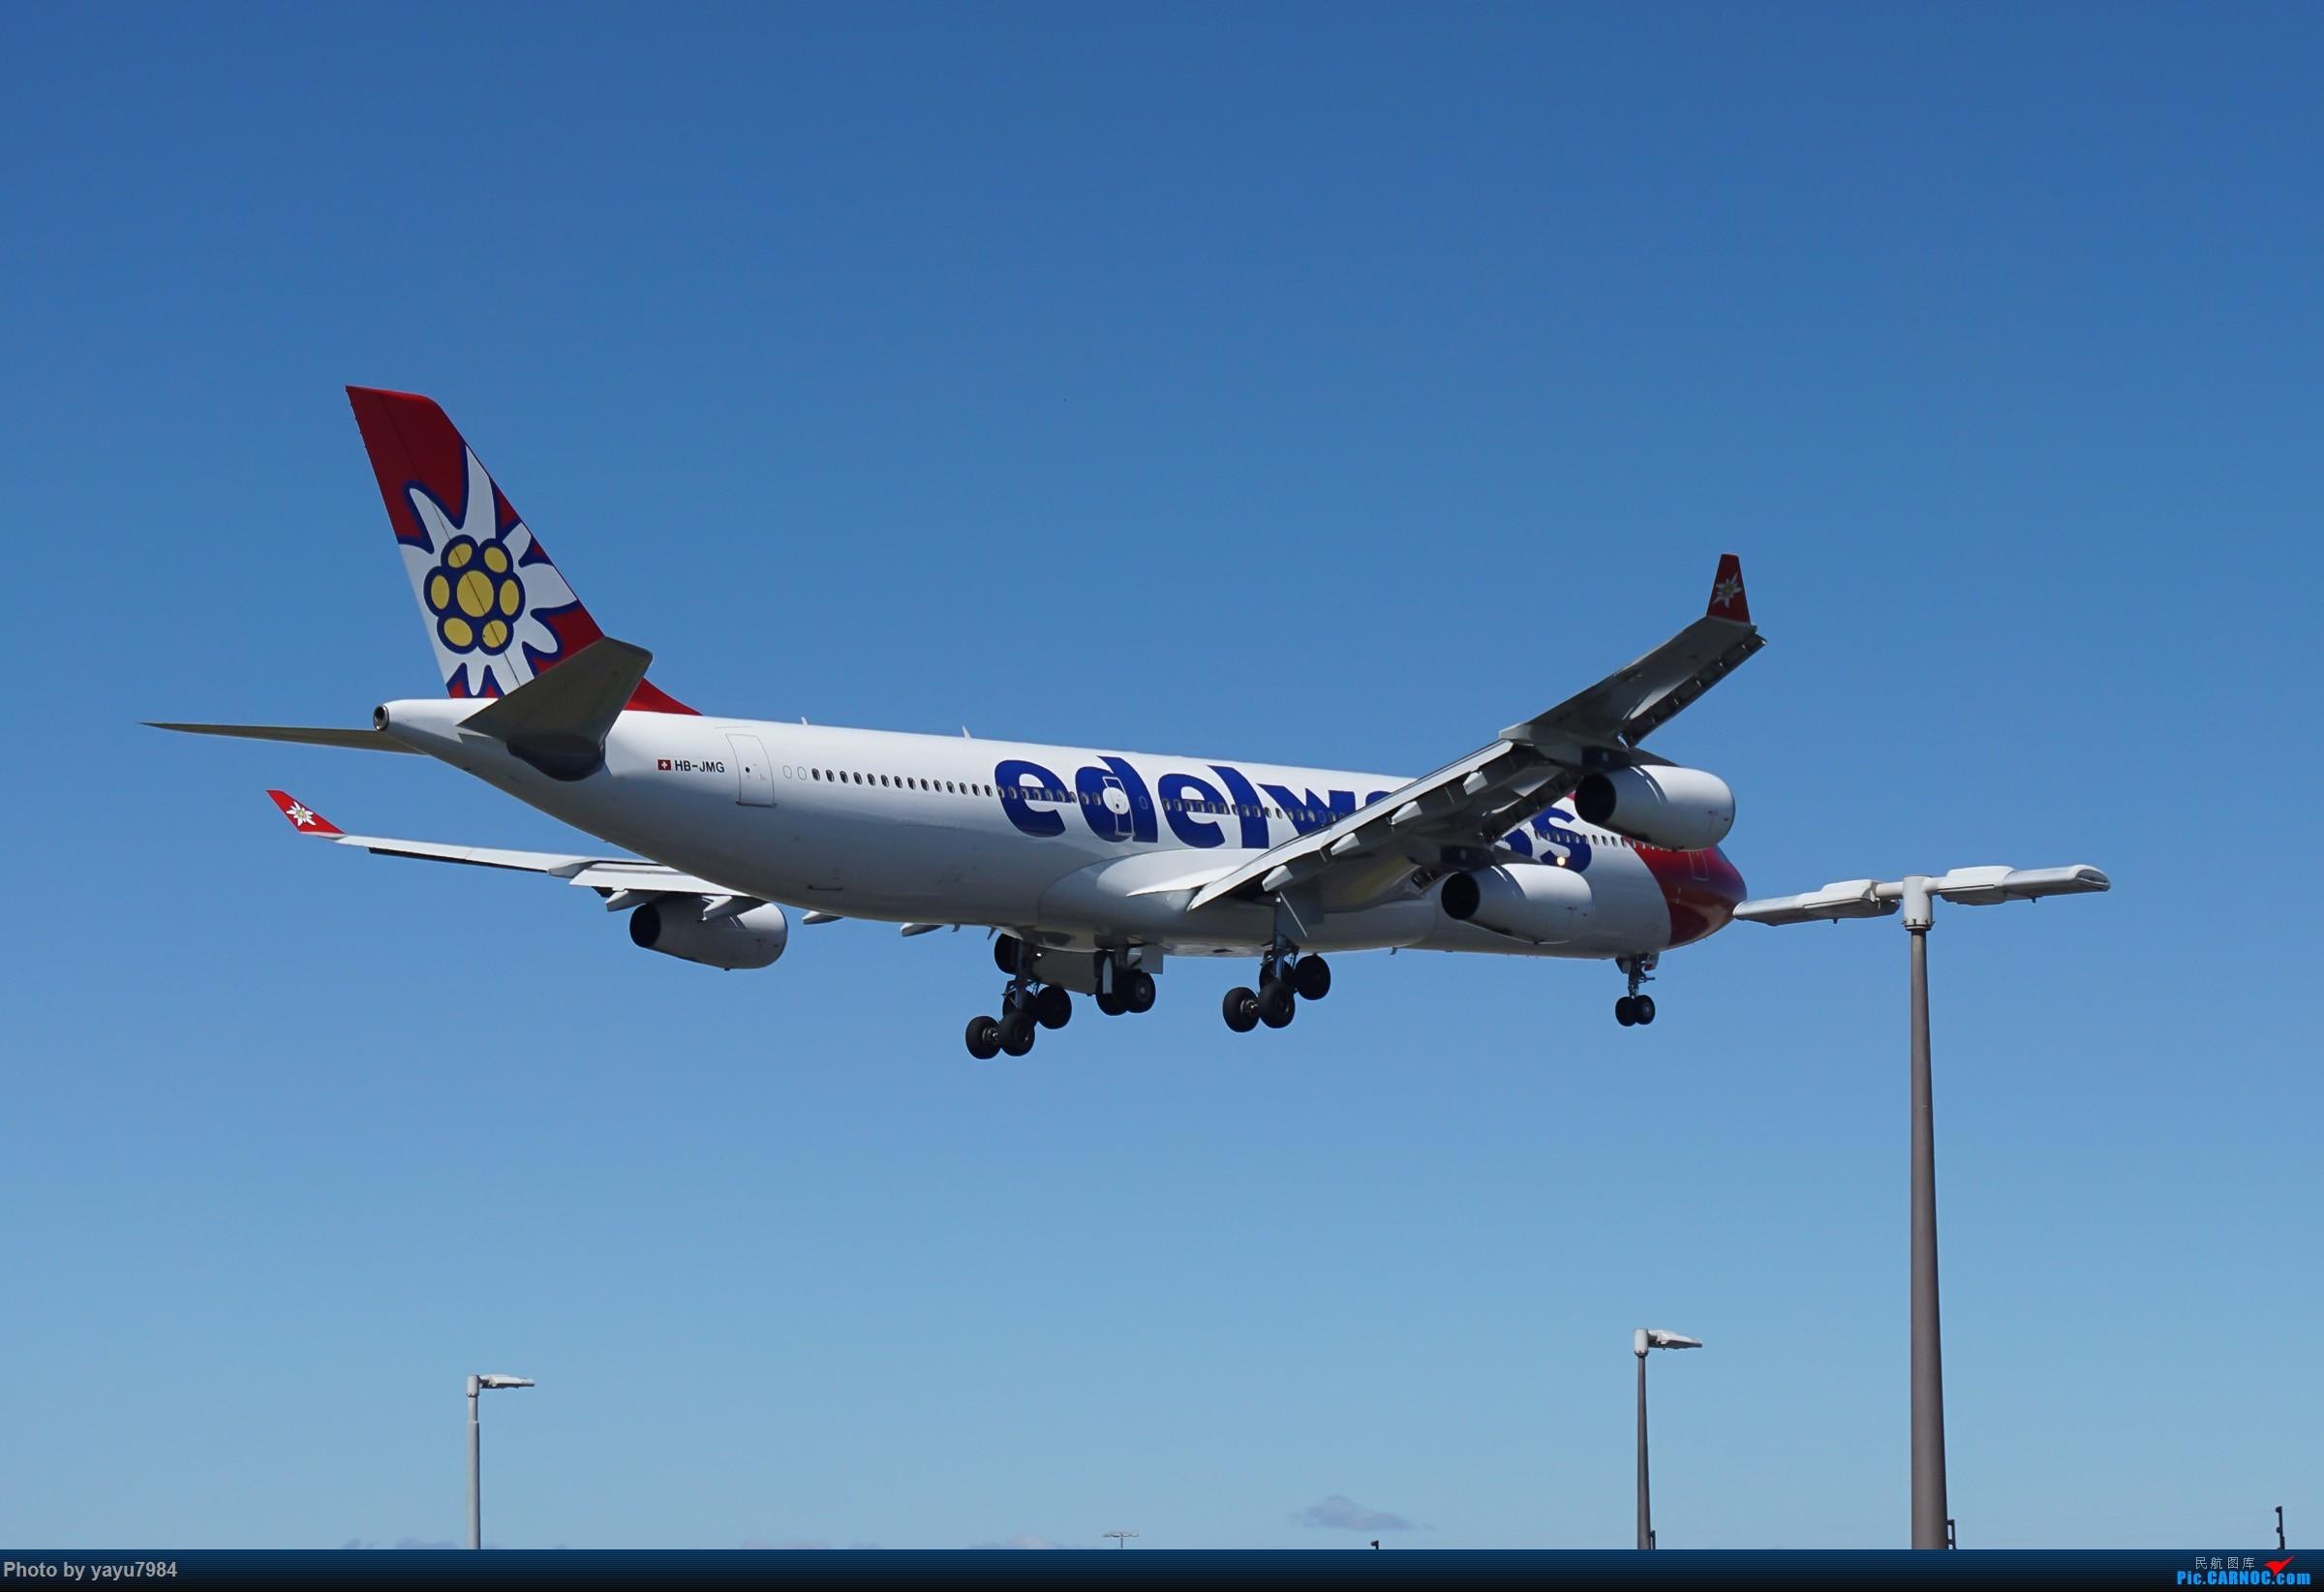 Re:[原创][SYD] 东航天合332,雪绒花343,华航蓝鹊,以及其他日常货 AIRBUS A340-300 HB-JMG 澳大利亚悉尼金斯福德·史密斯机场